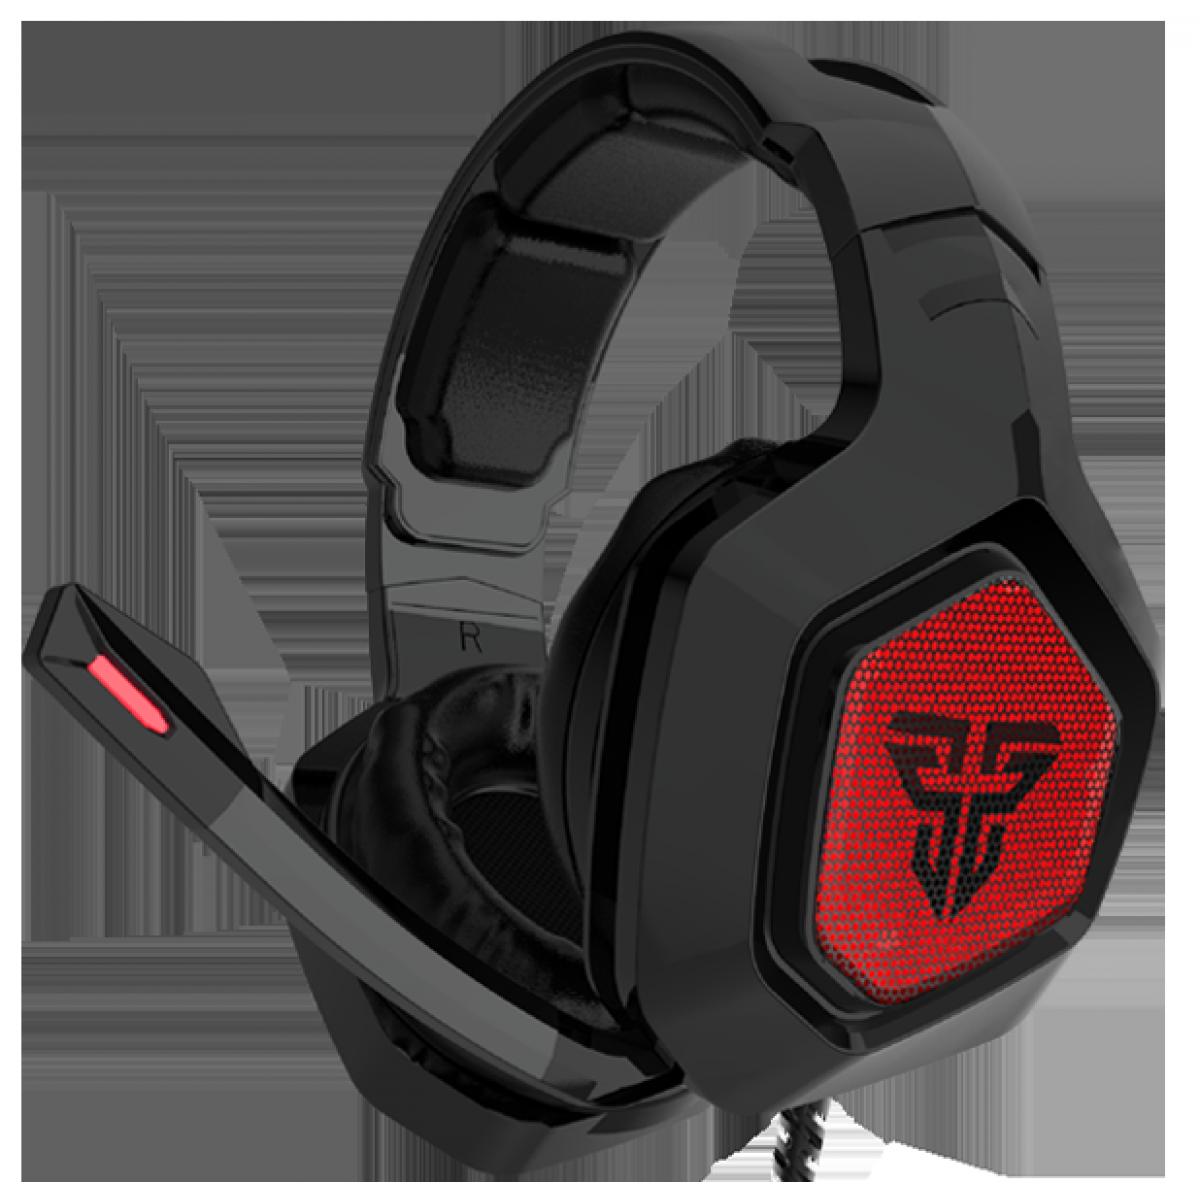 Headset Gamer Fantech Omni, 3.5mm + USB, RGB, Black/Red, MH83